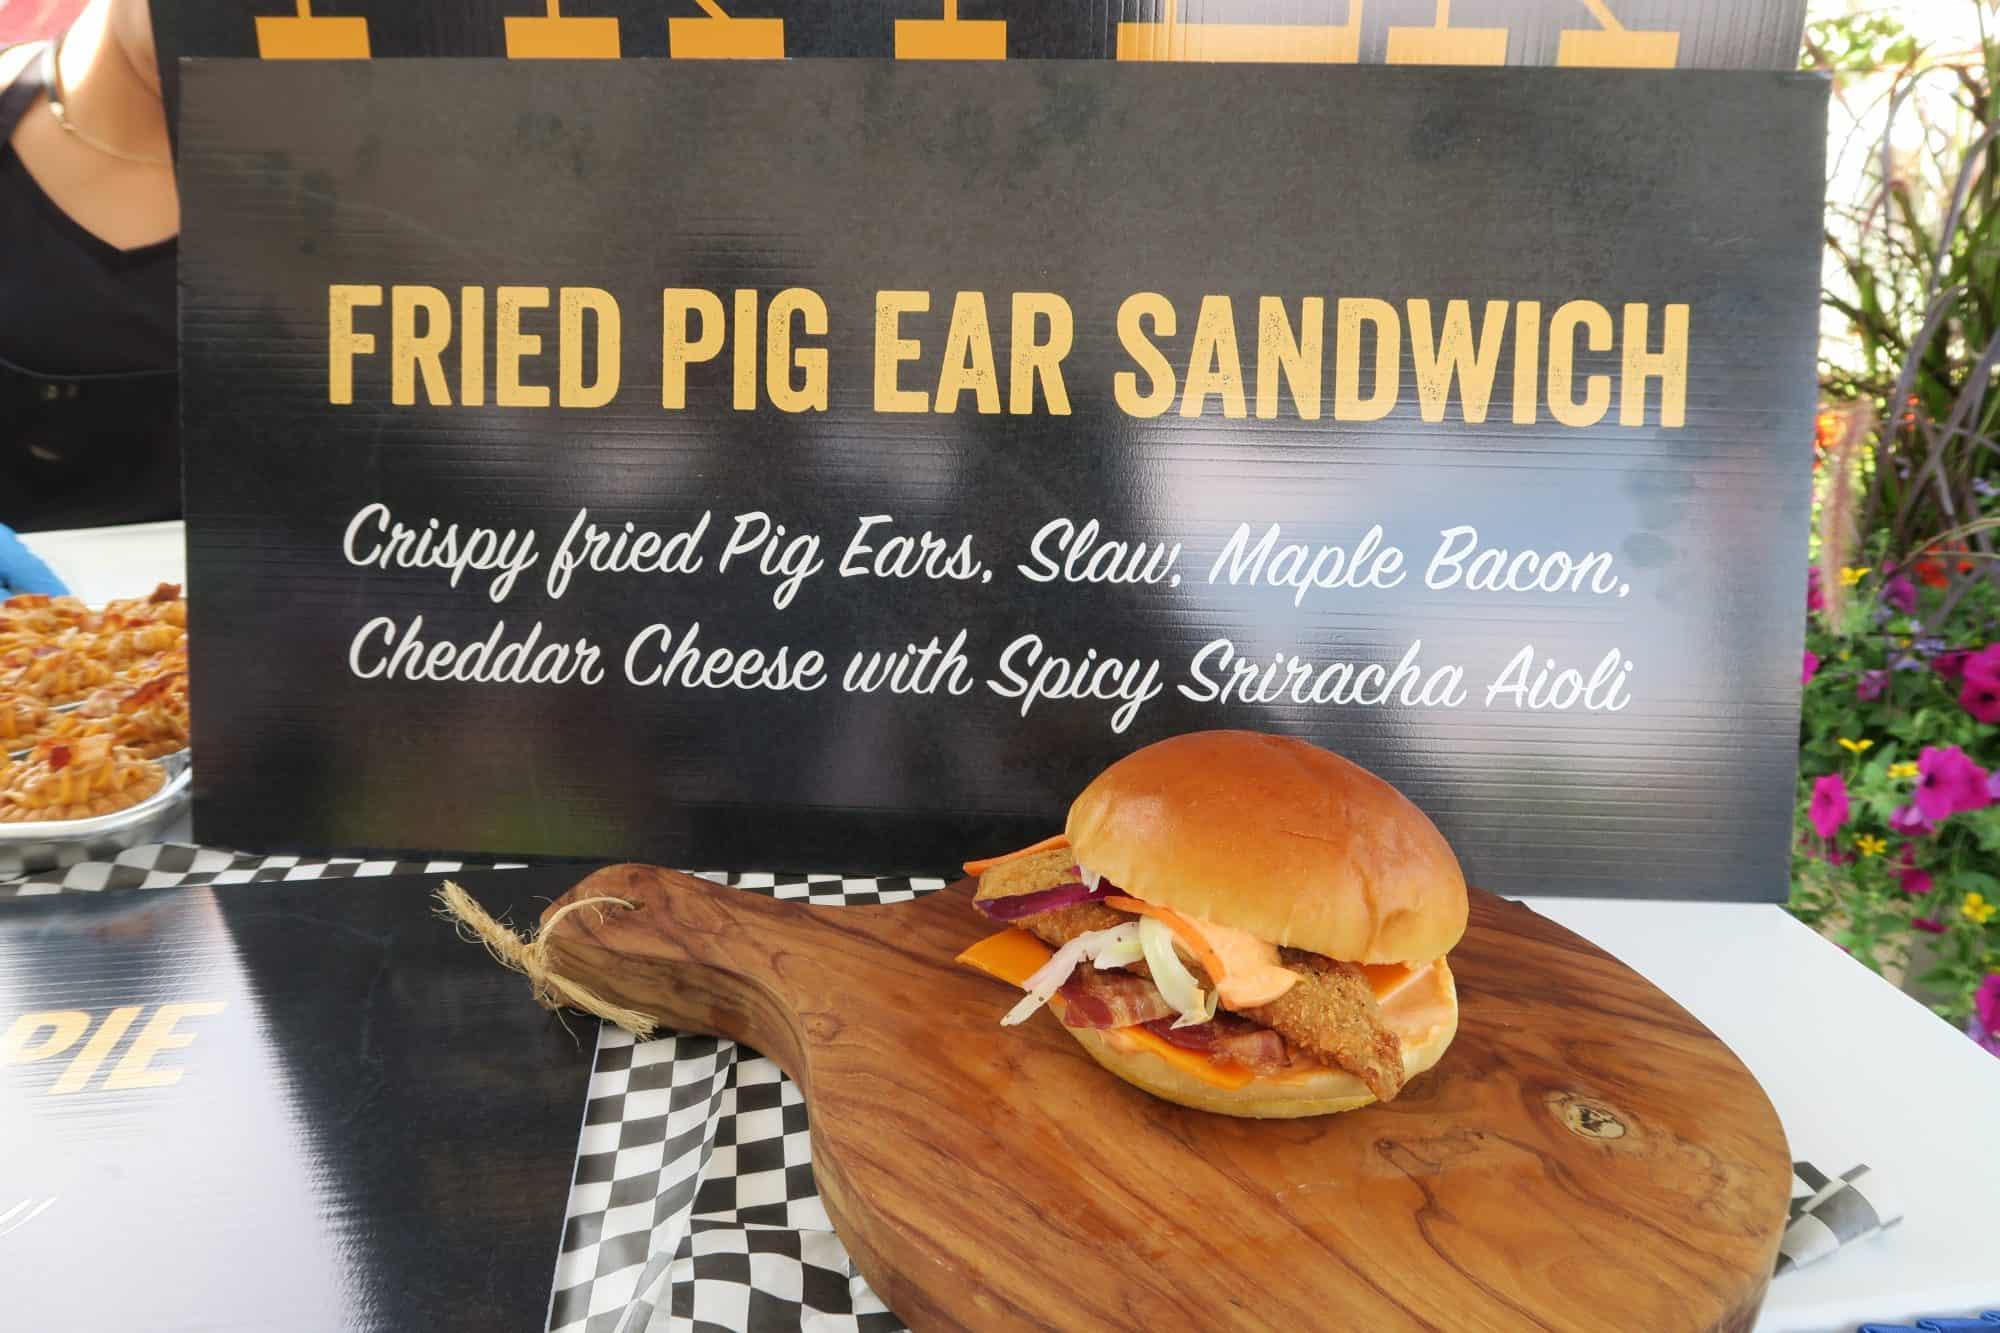 CNE Pig Ear Sandwich